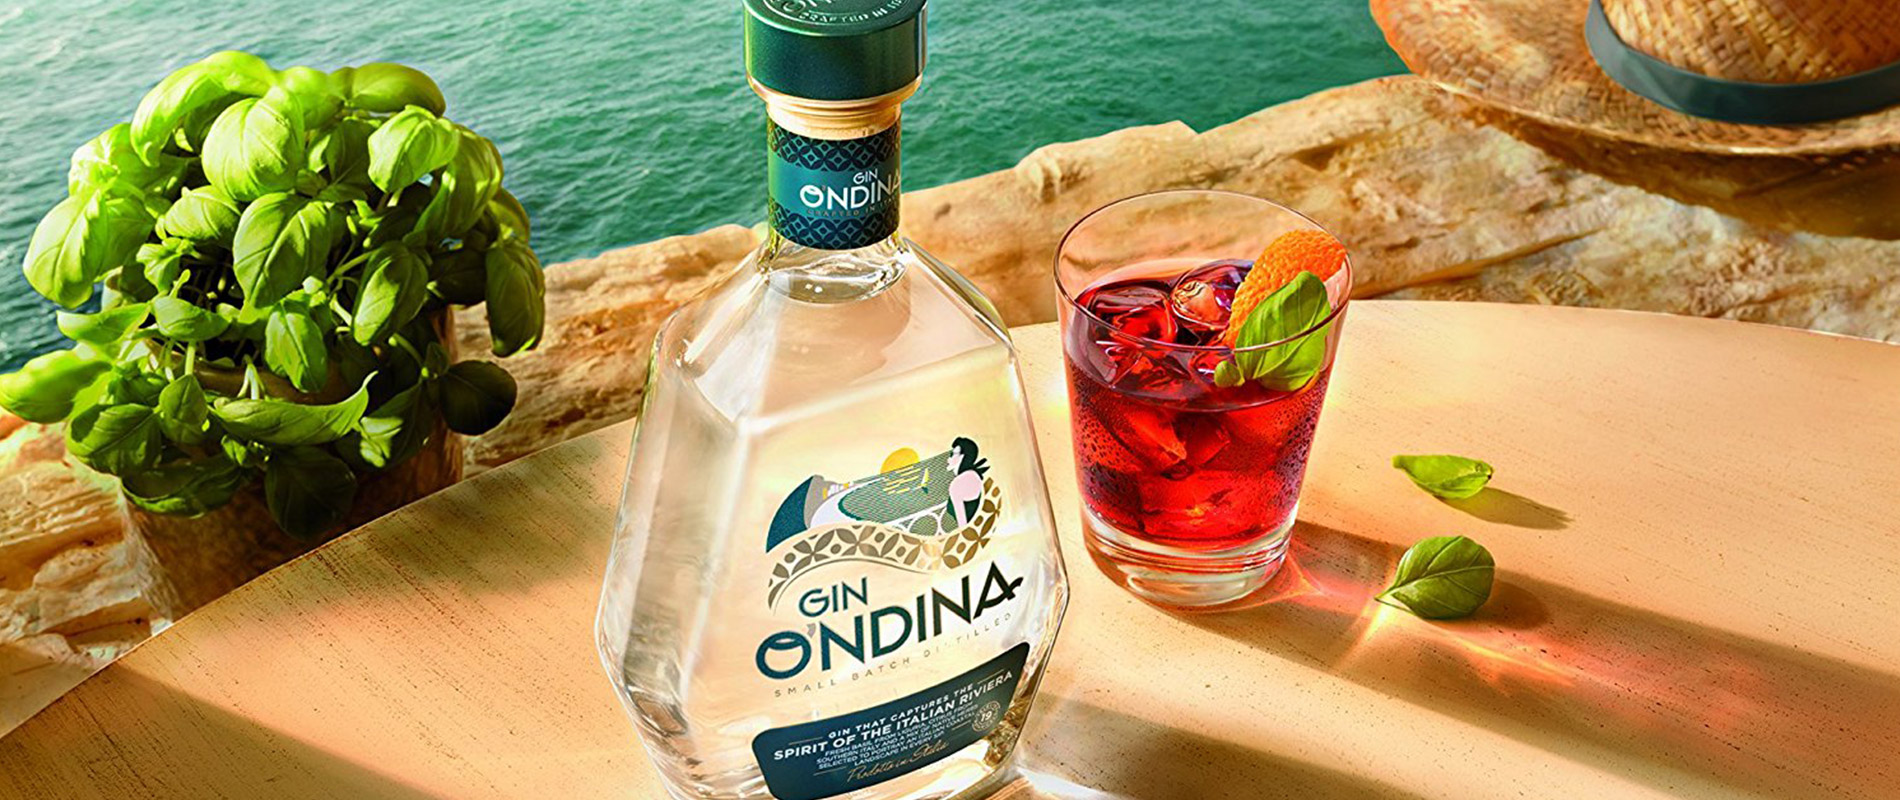 Gin O'ndina: Spirito Italiano